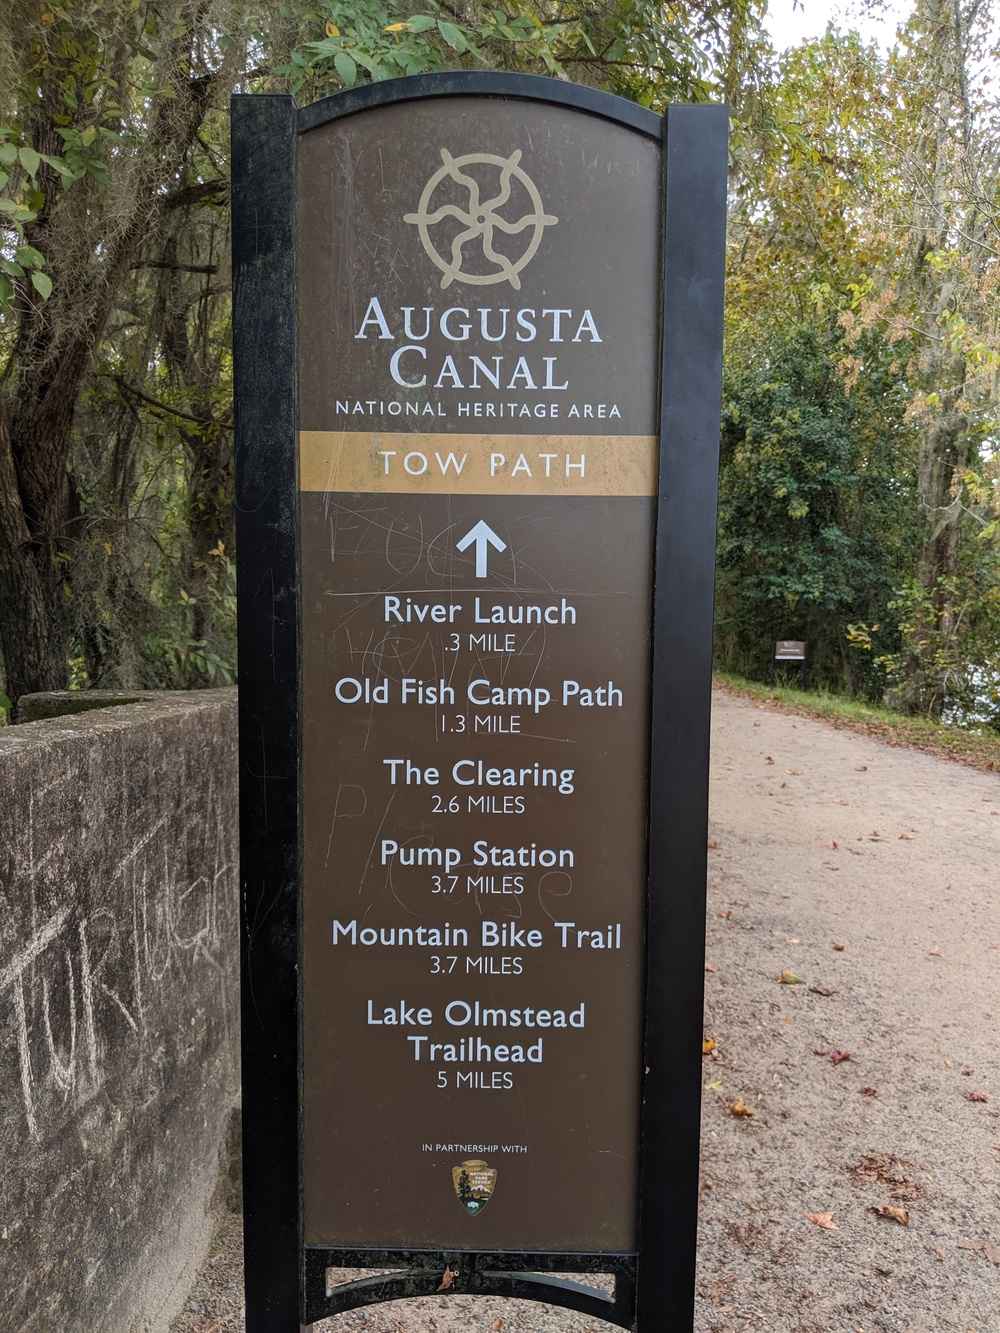 Fall back into hiking and biking